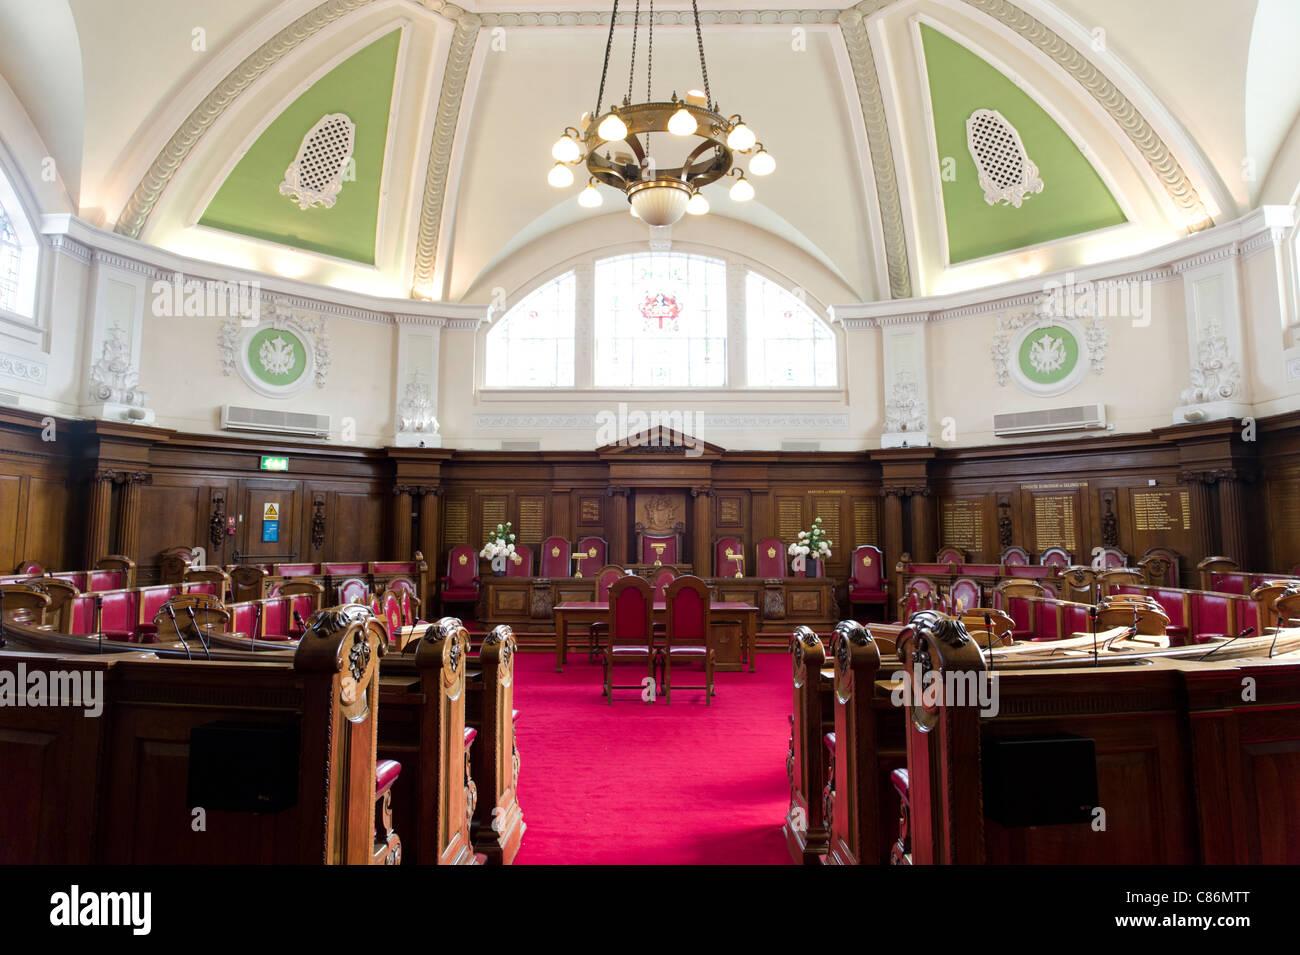 Council chamber at Islington town hall, London, England, UK - Stock Image